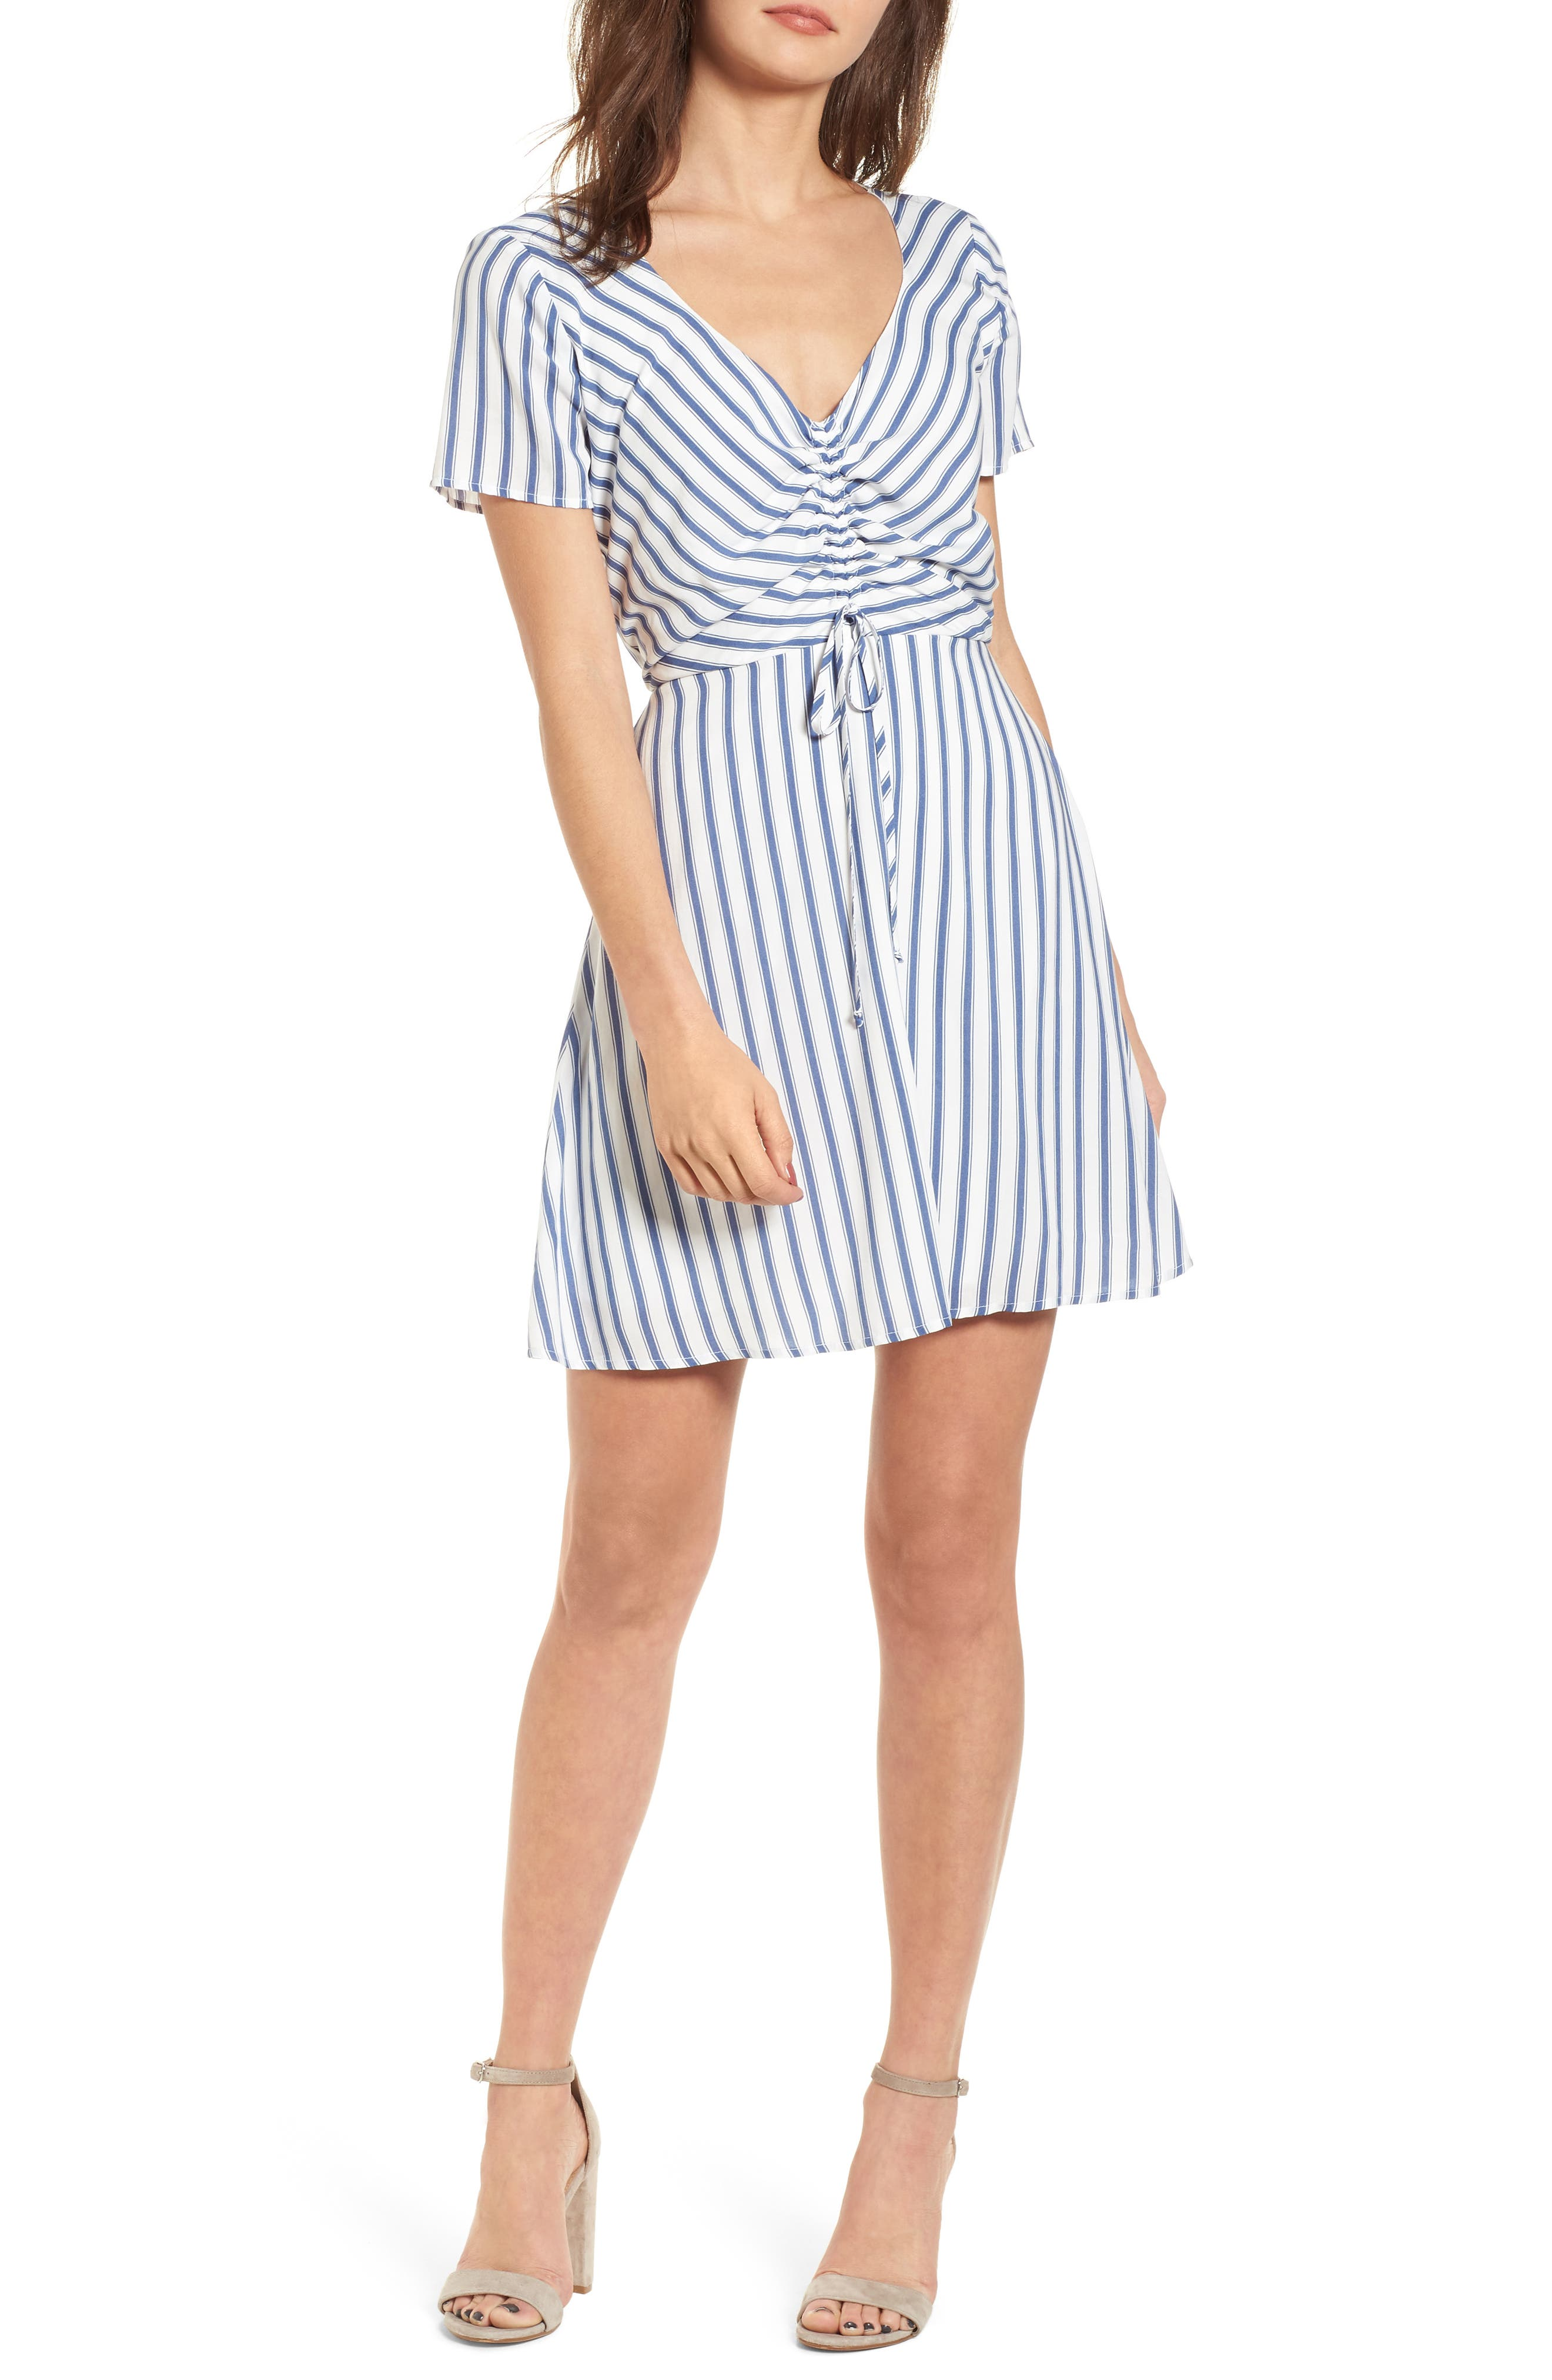 Cinch Front Minidress,                             Main thumbnail 1, color,                             Blue/ White Stripe